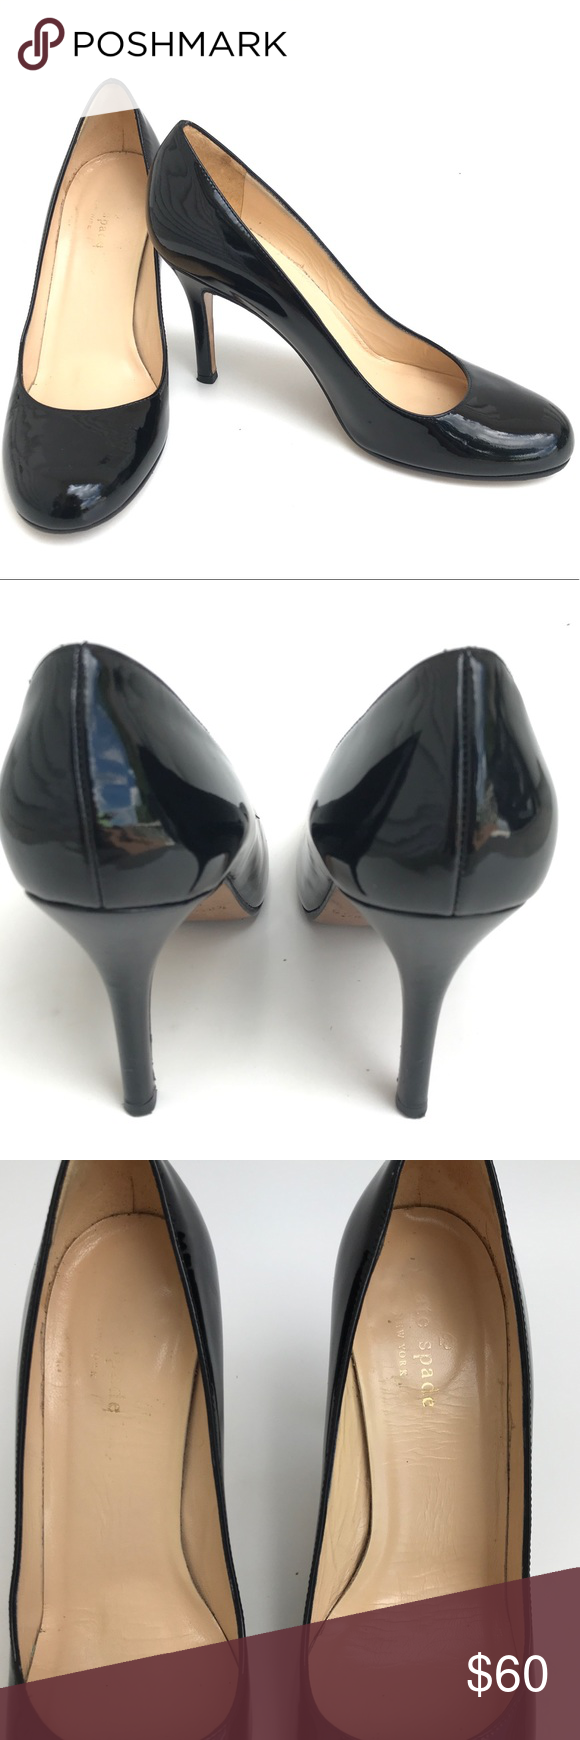 8607a51b0105 Kate Spade Karolina classic patent leather narrow Classic black patent  leather Karolina pump by Kate Spade